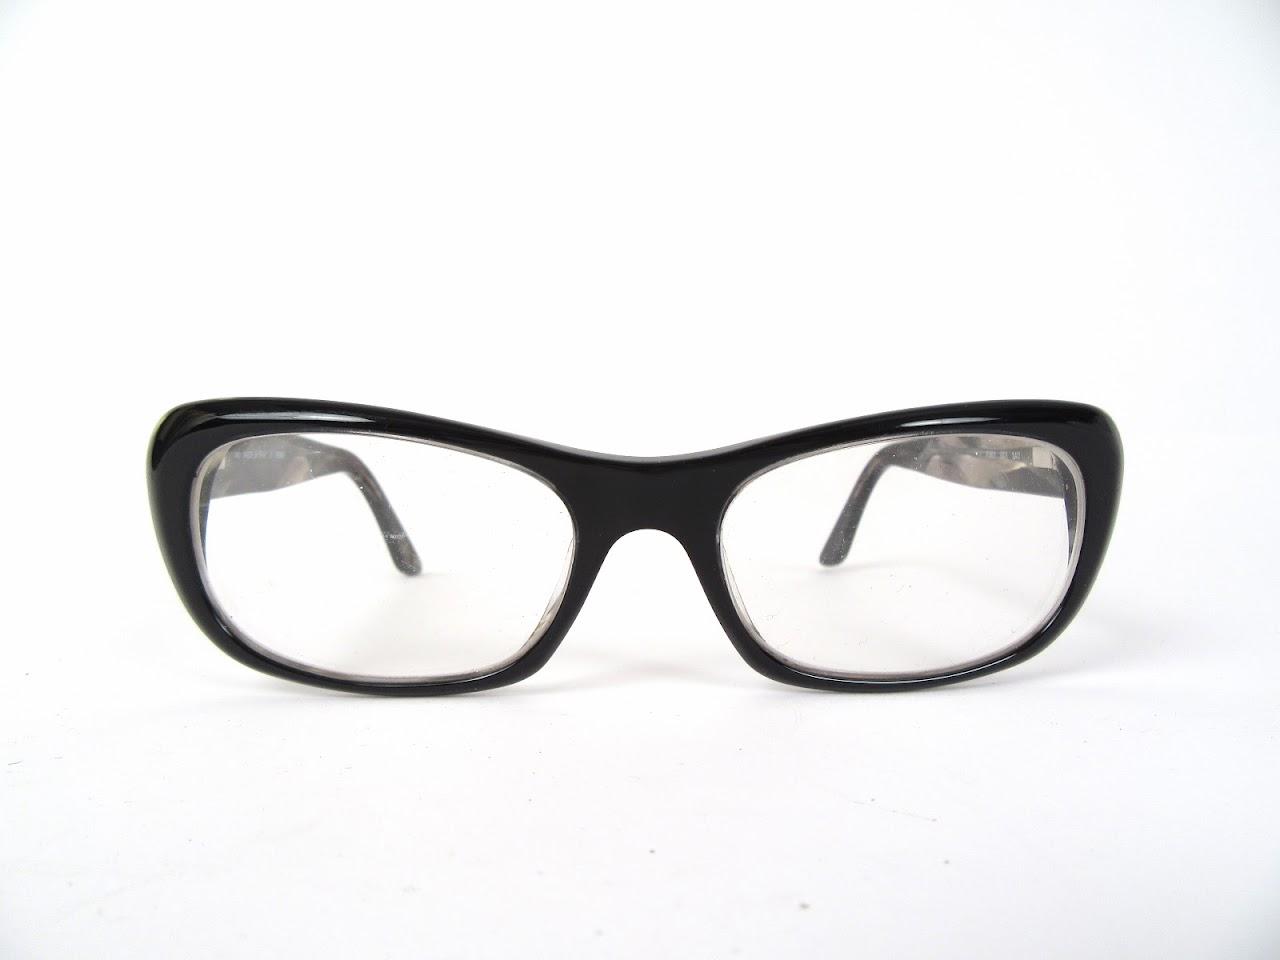 Fendi RX Glasses